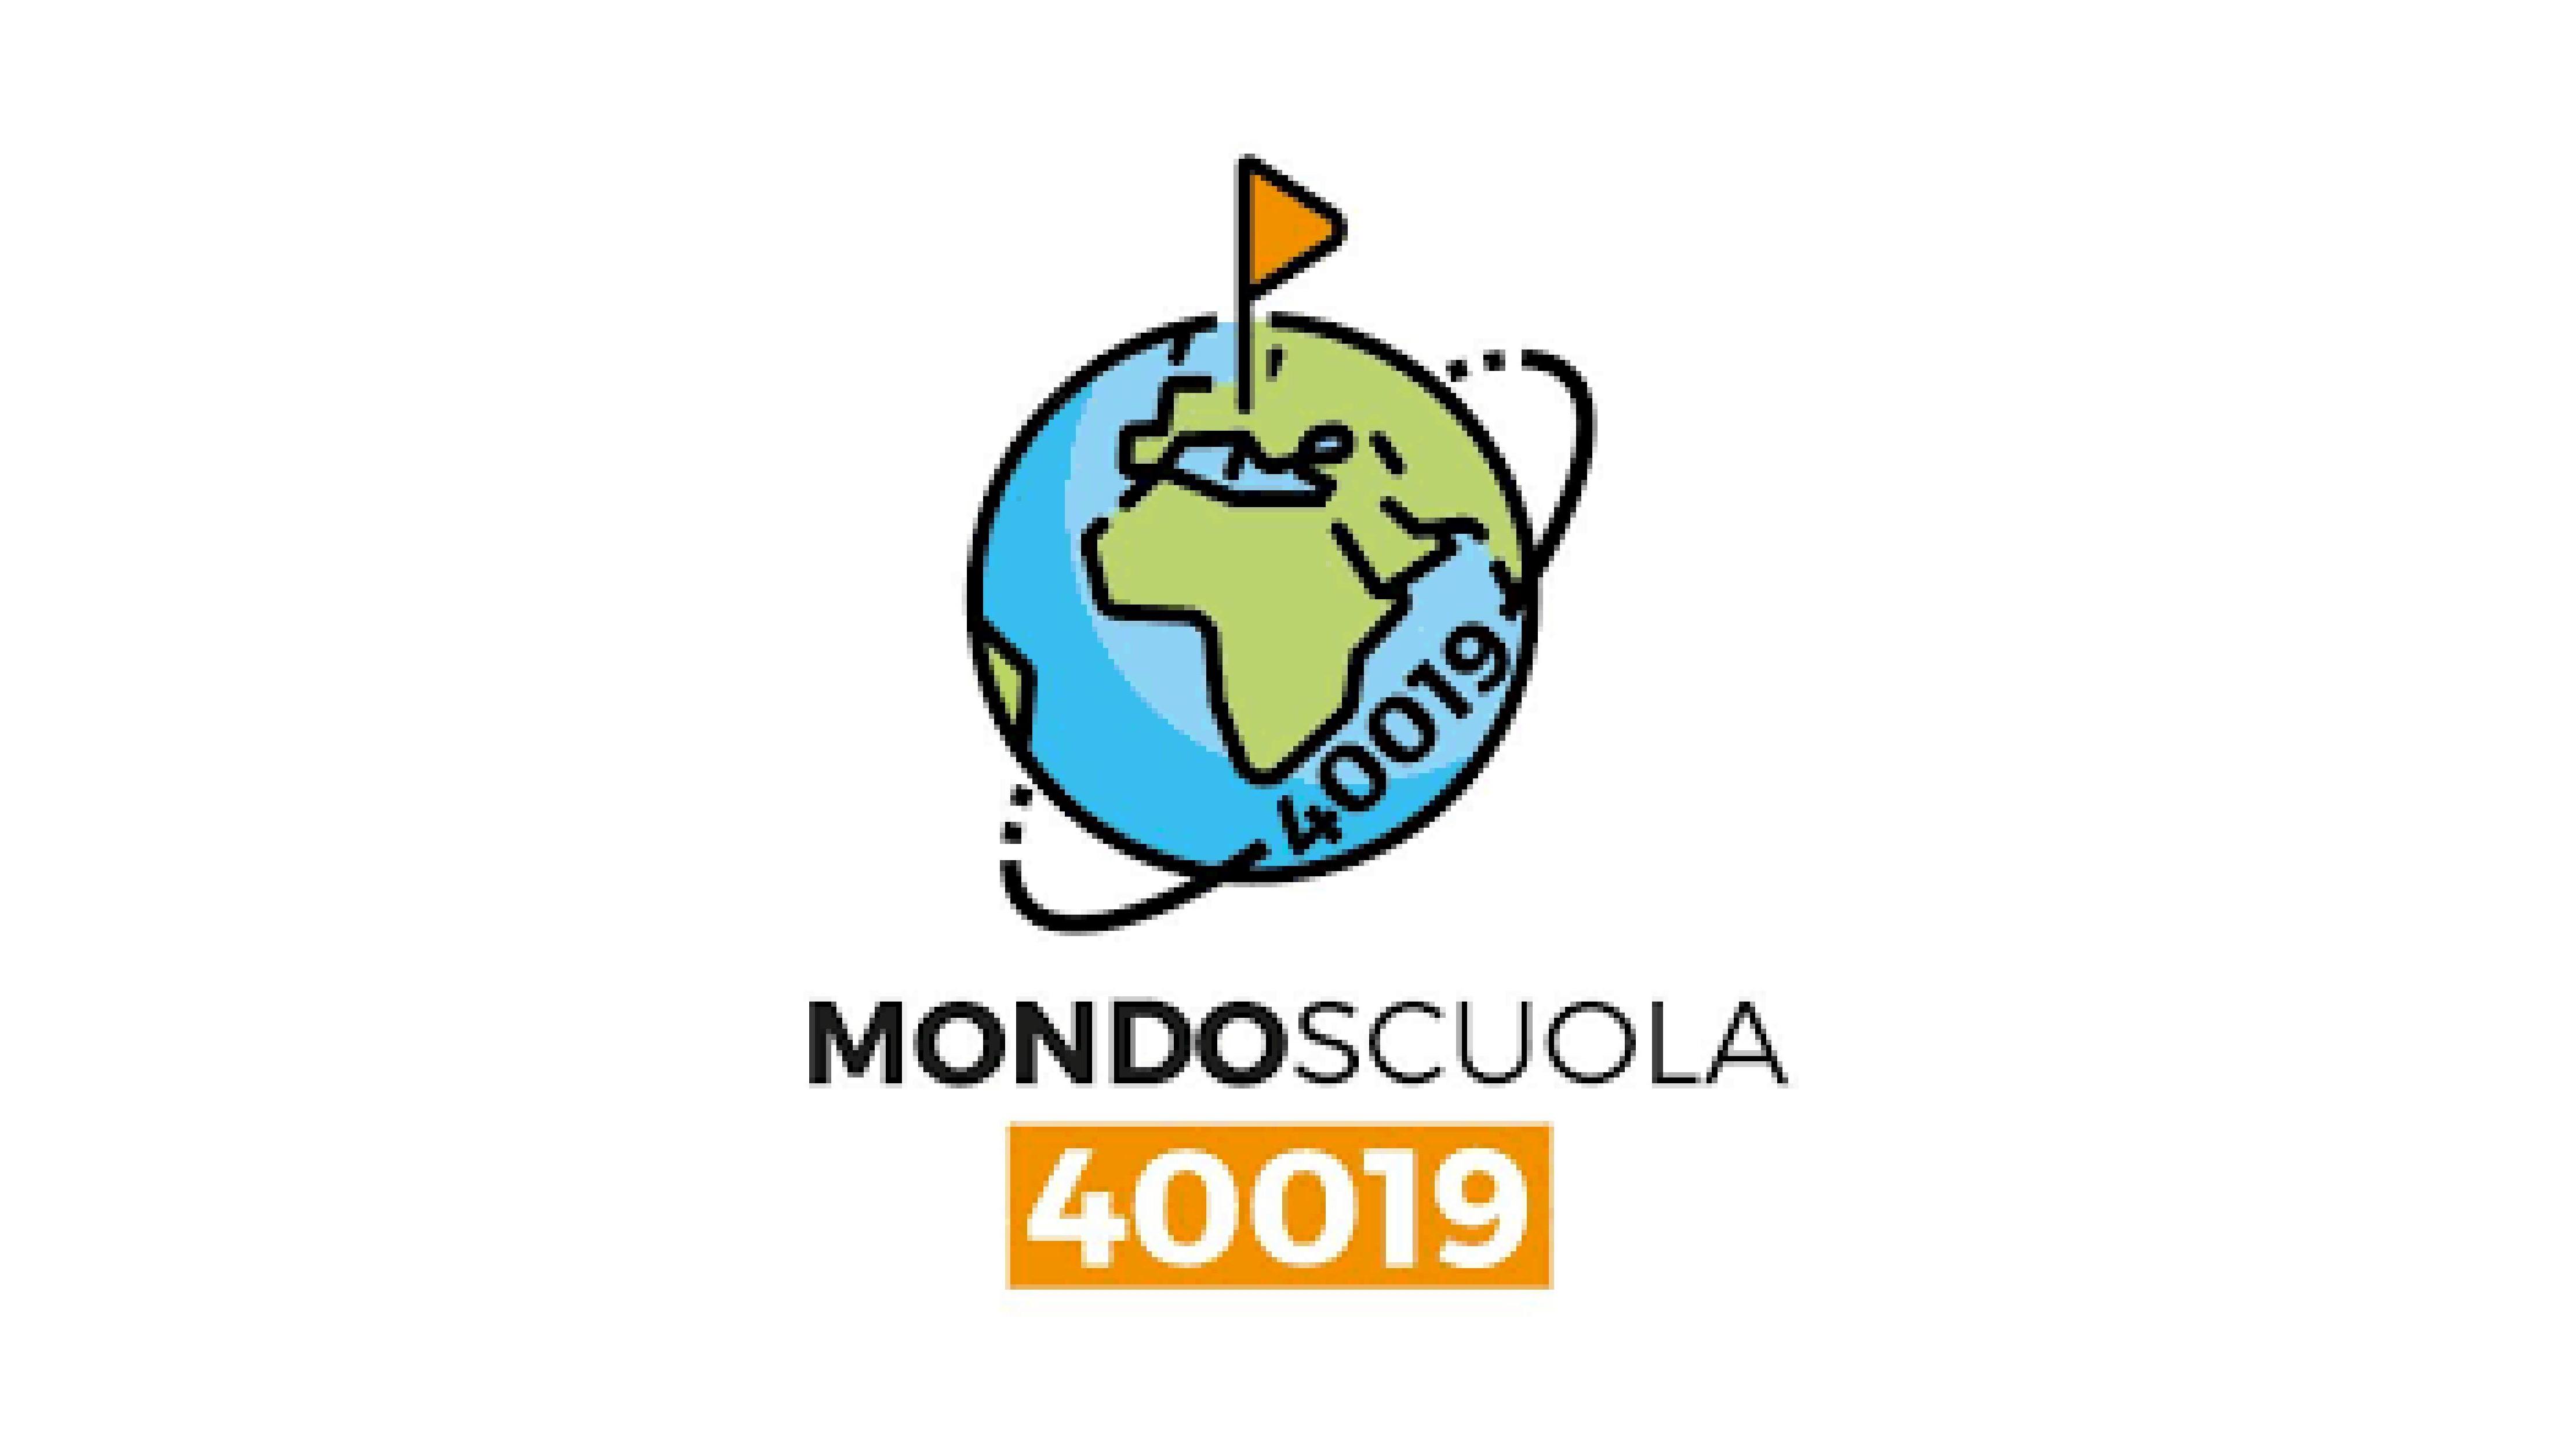 MondoScuola